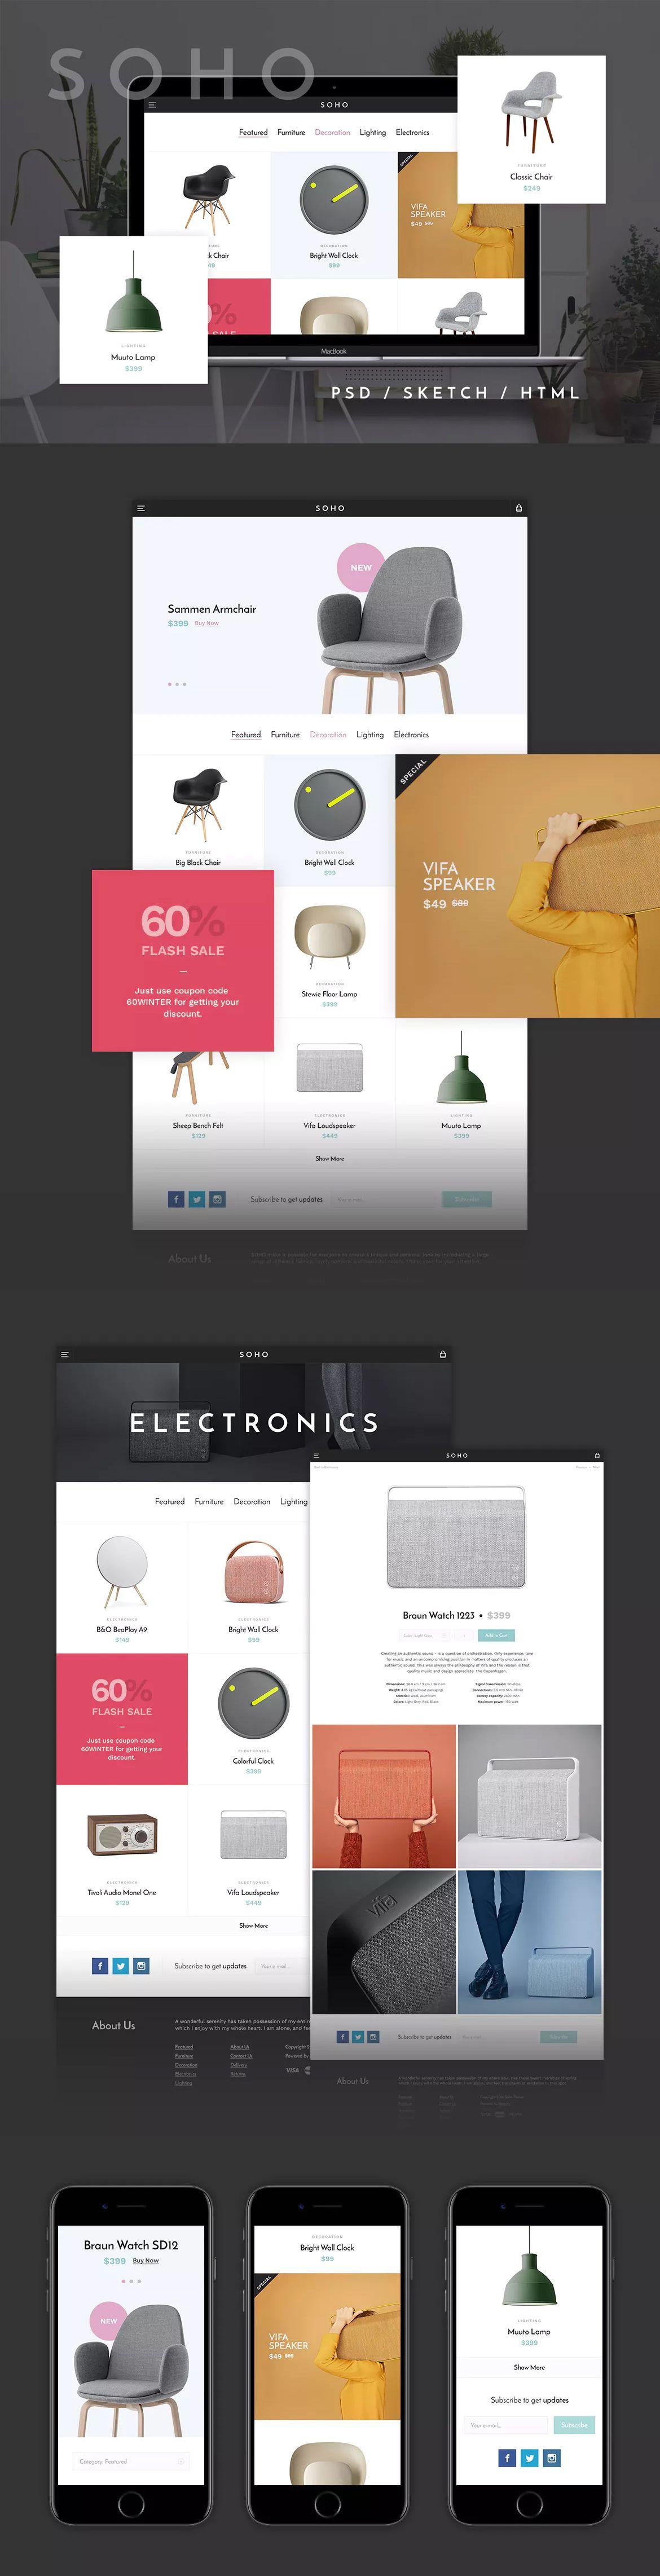 Soho Template (PSD, Sketch, HTML) | HTML Website Templates ...